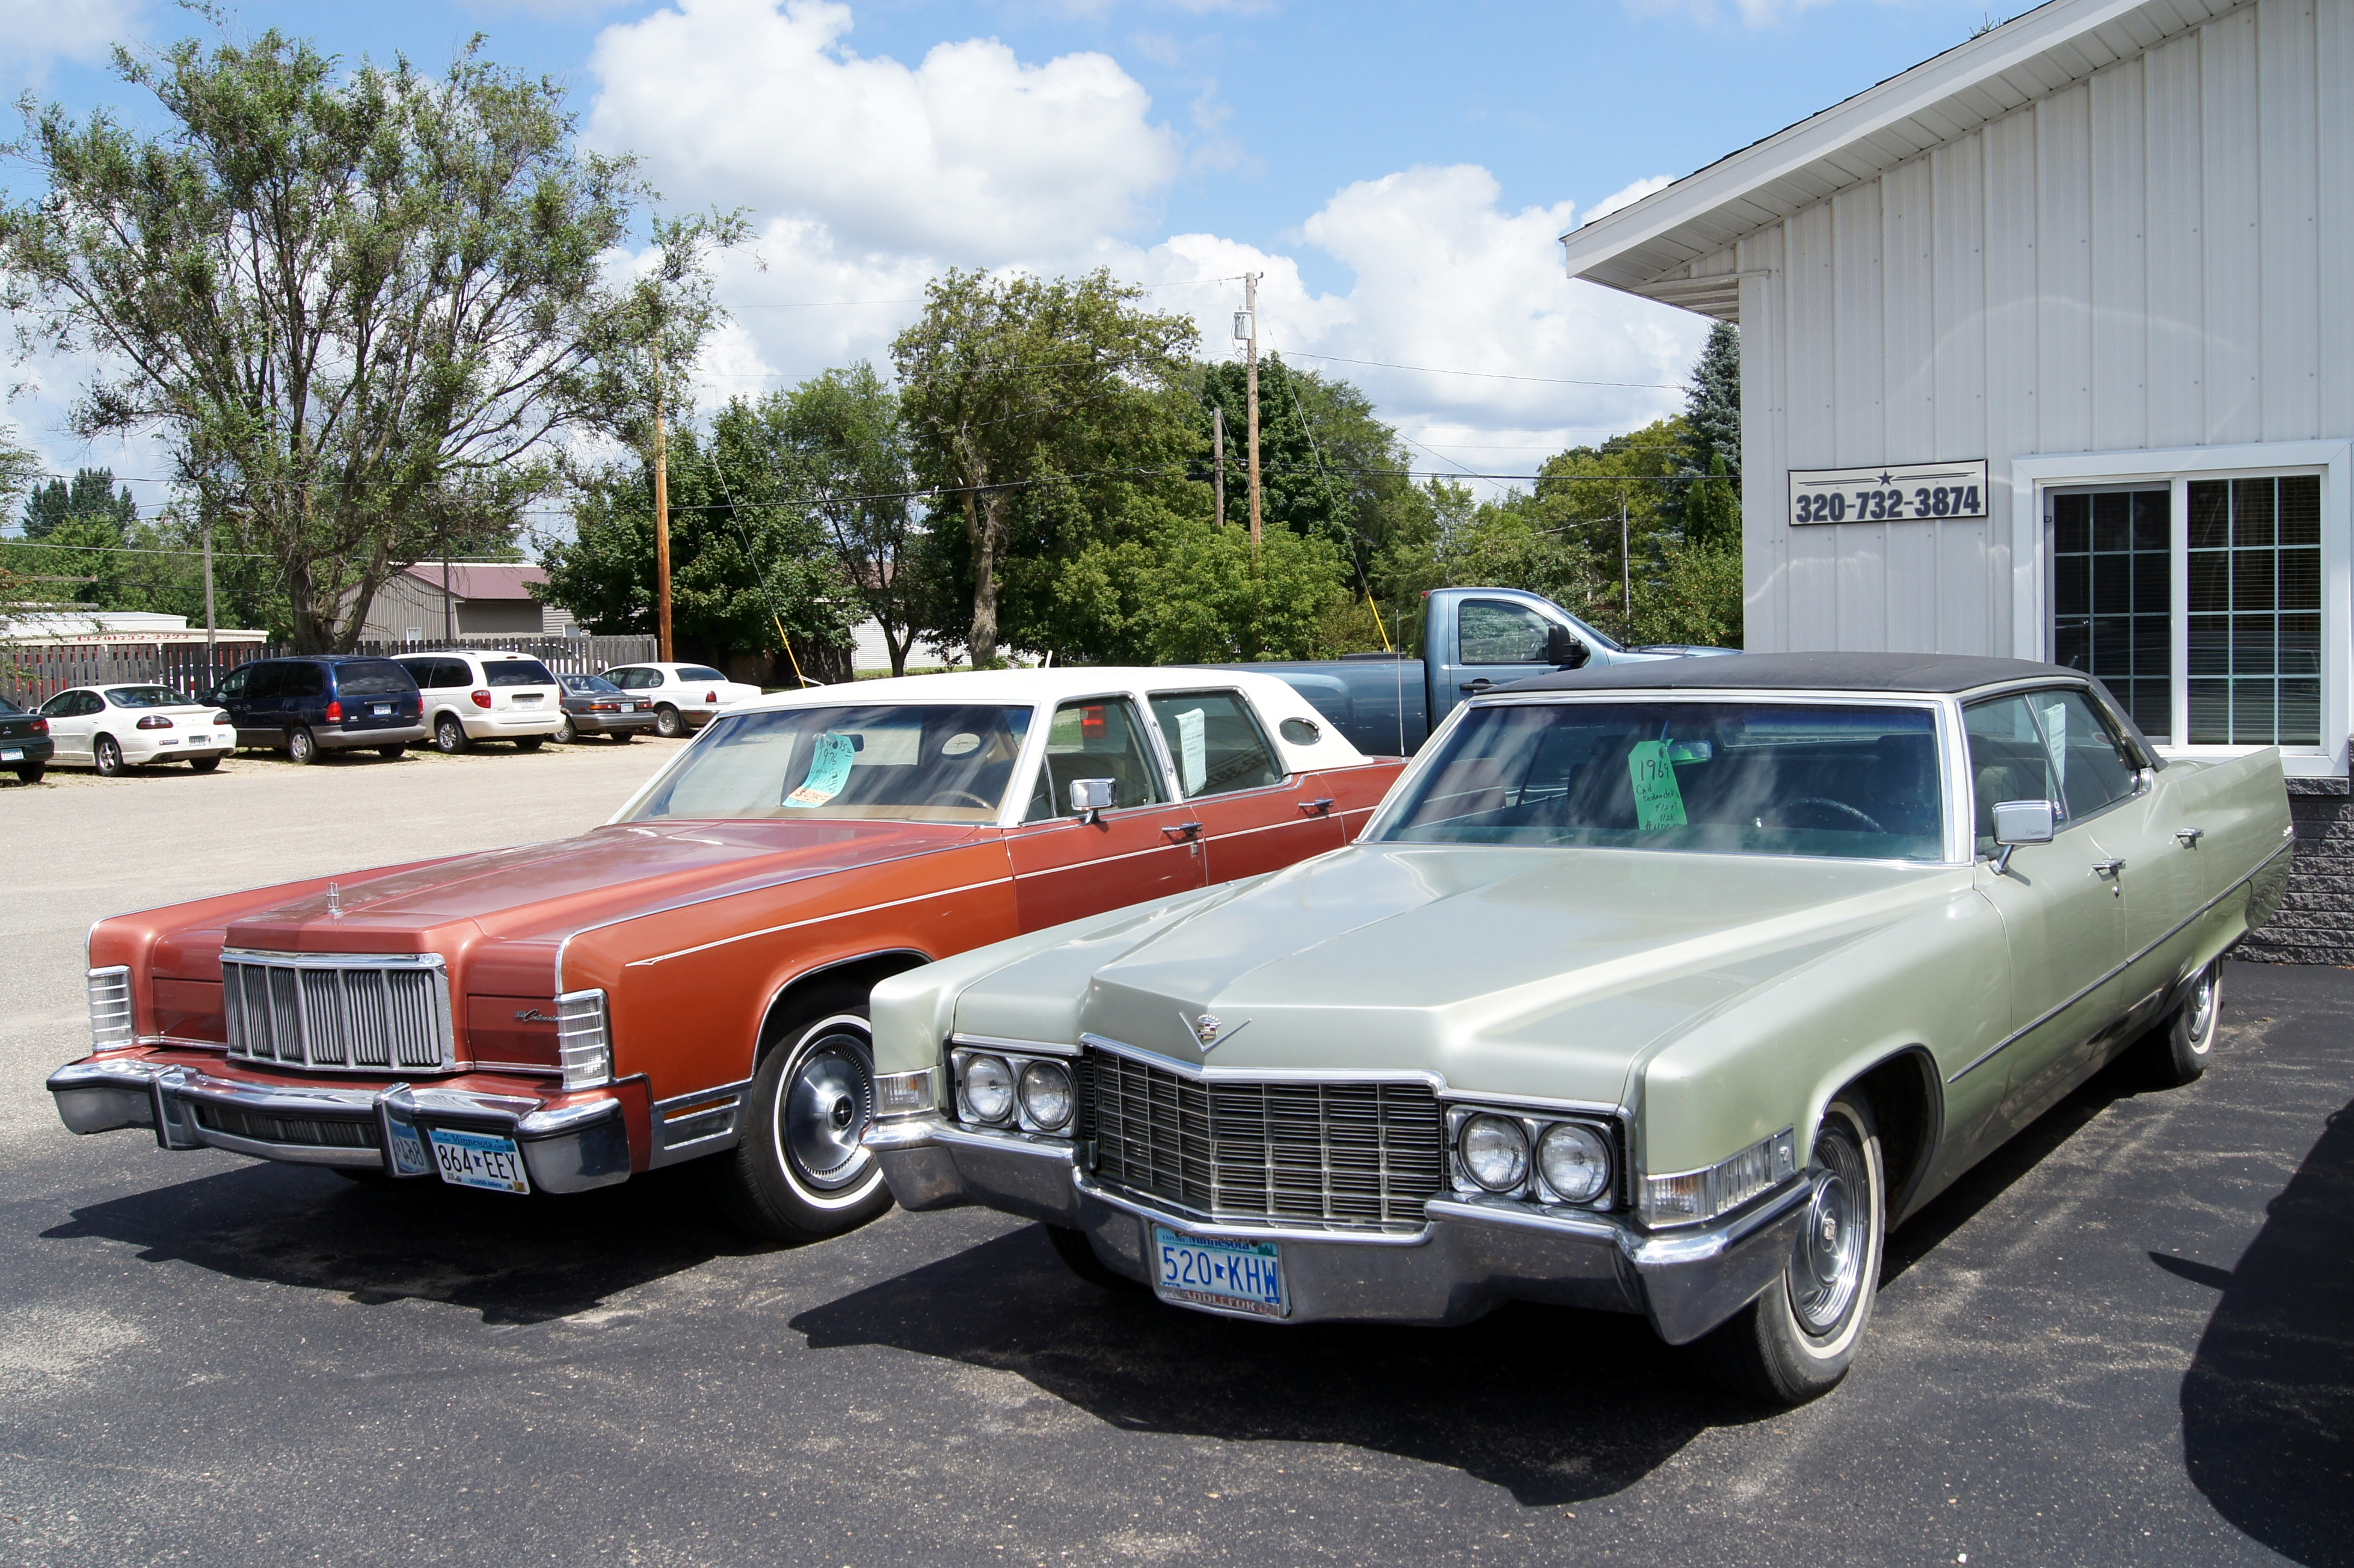 File:69 Cadillac Sedan de Ville & 76 Lincoln Continental Town Car (1